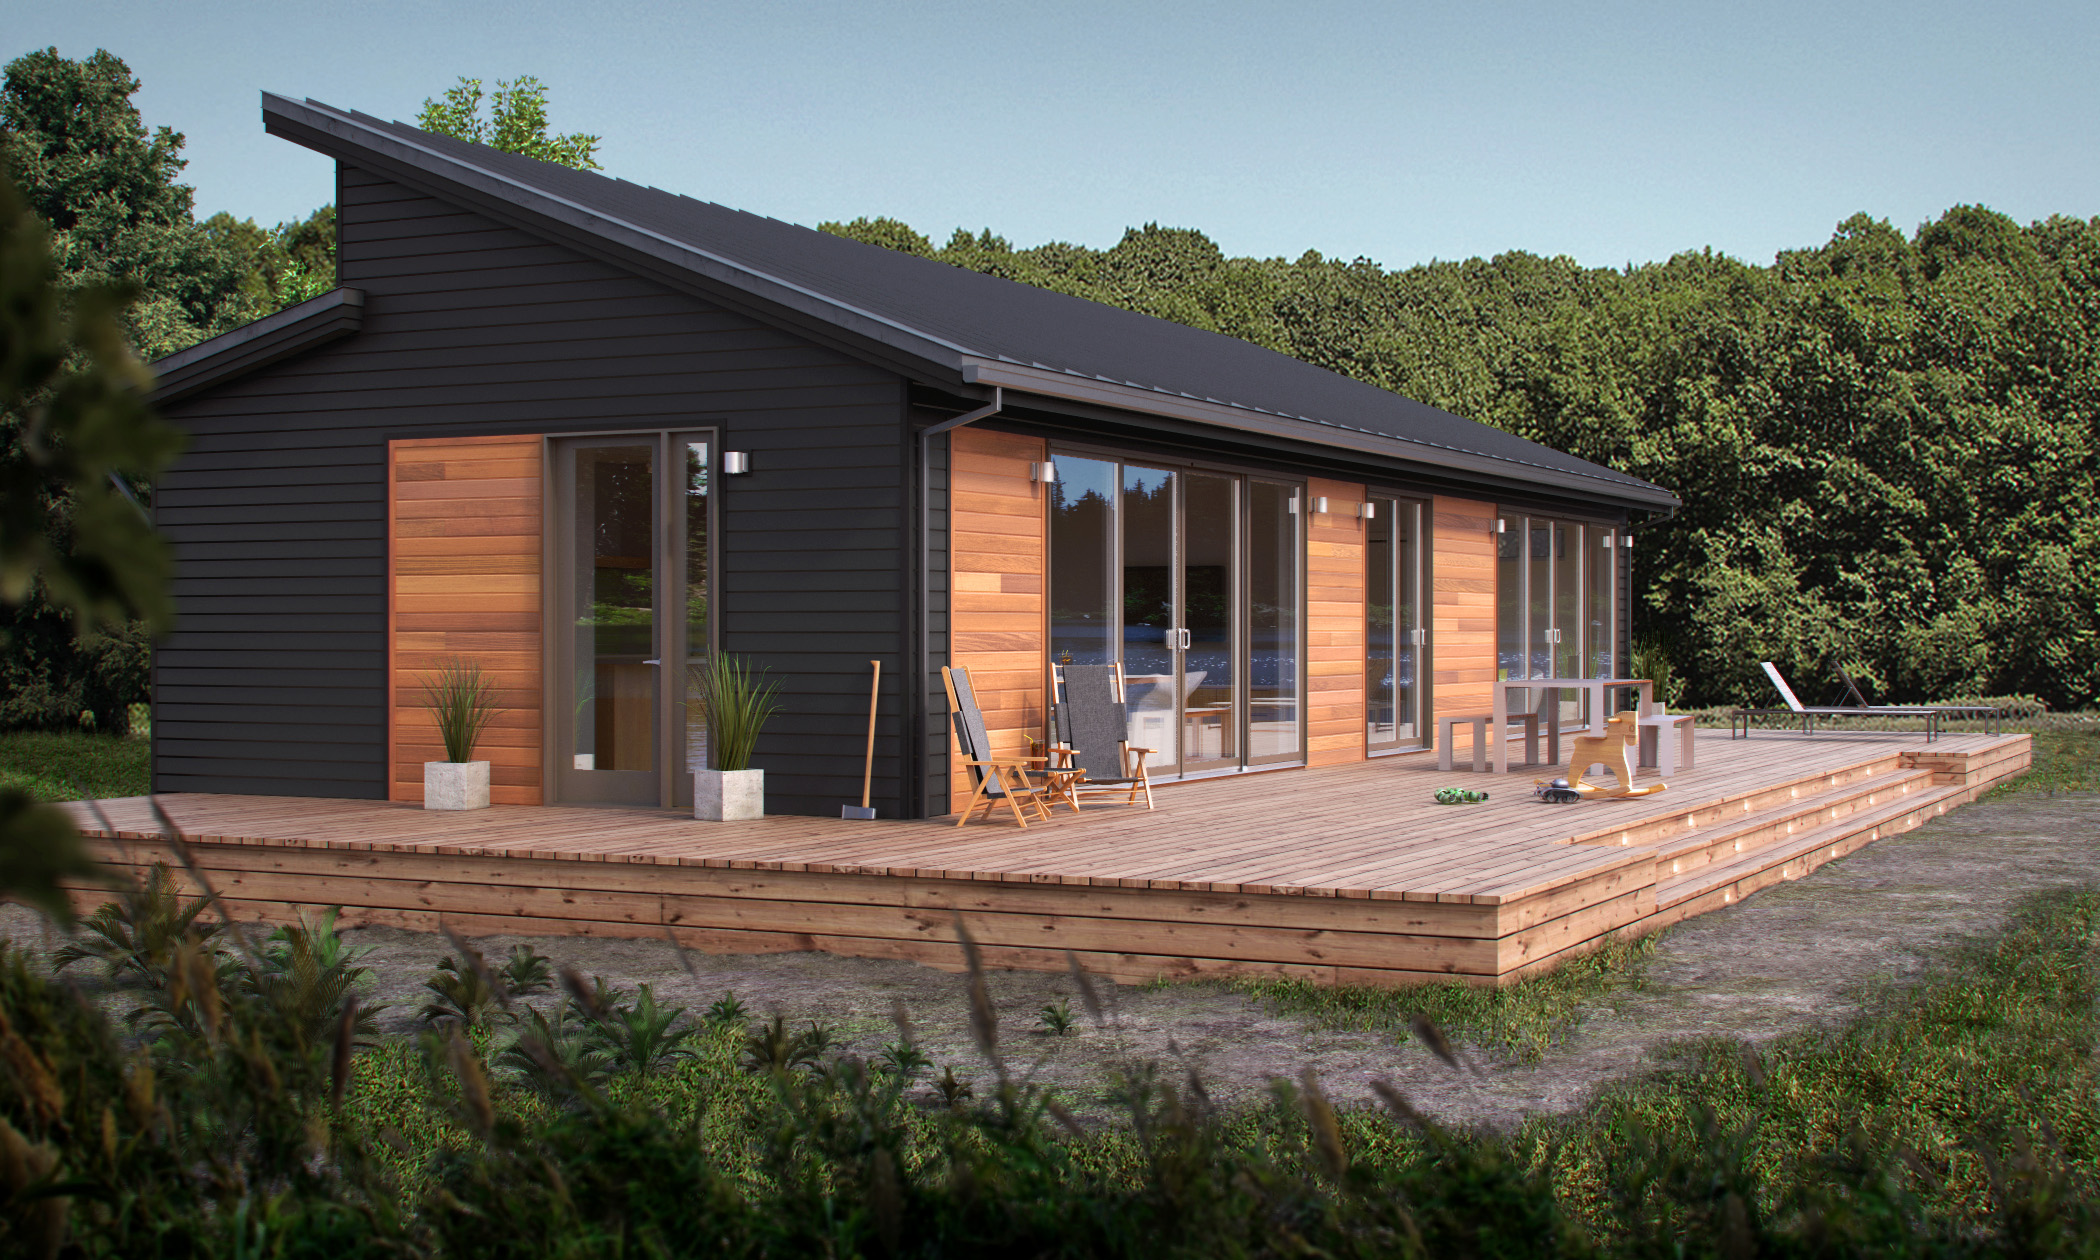 garage lighting ideas nz - Blu Homes' 2015 Product Line fers Enhanced Green